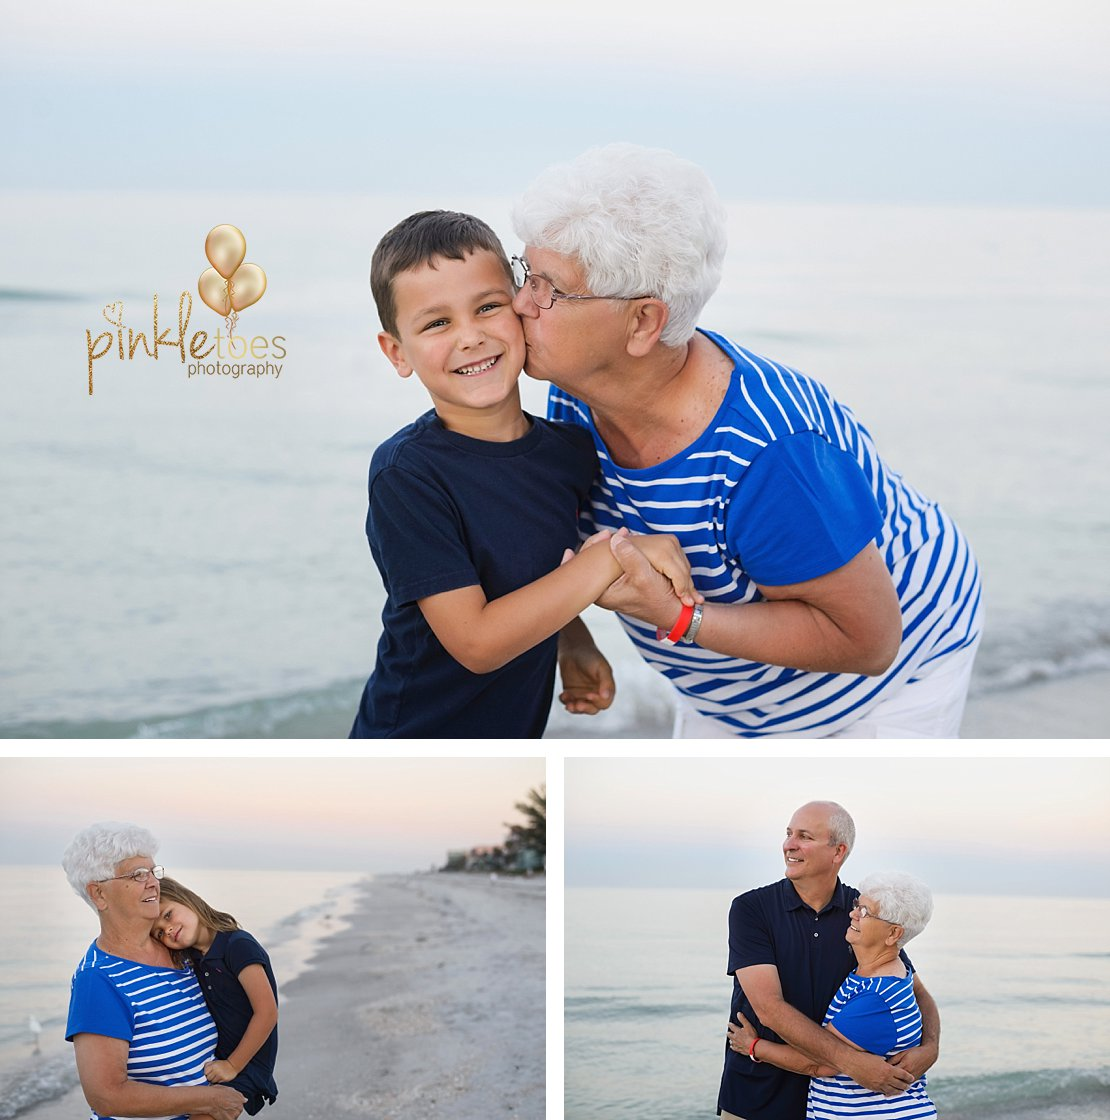 texas-florida-st-pete-family-beach-photography-005